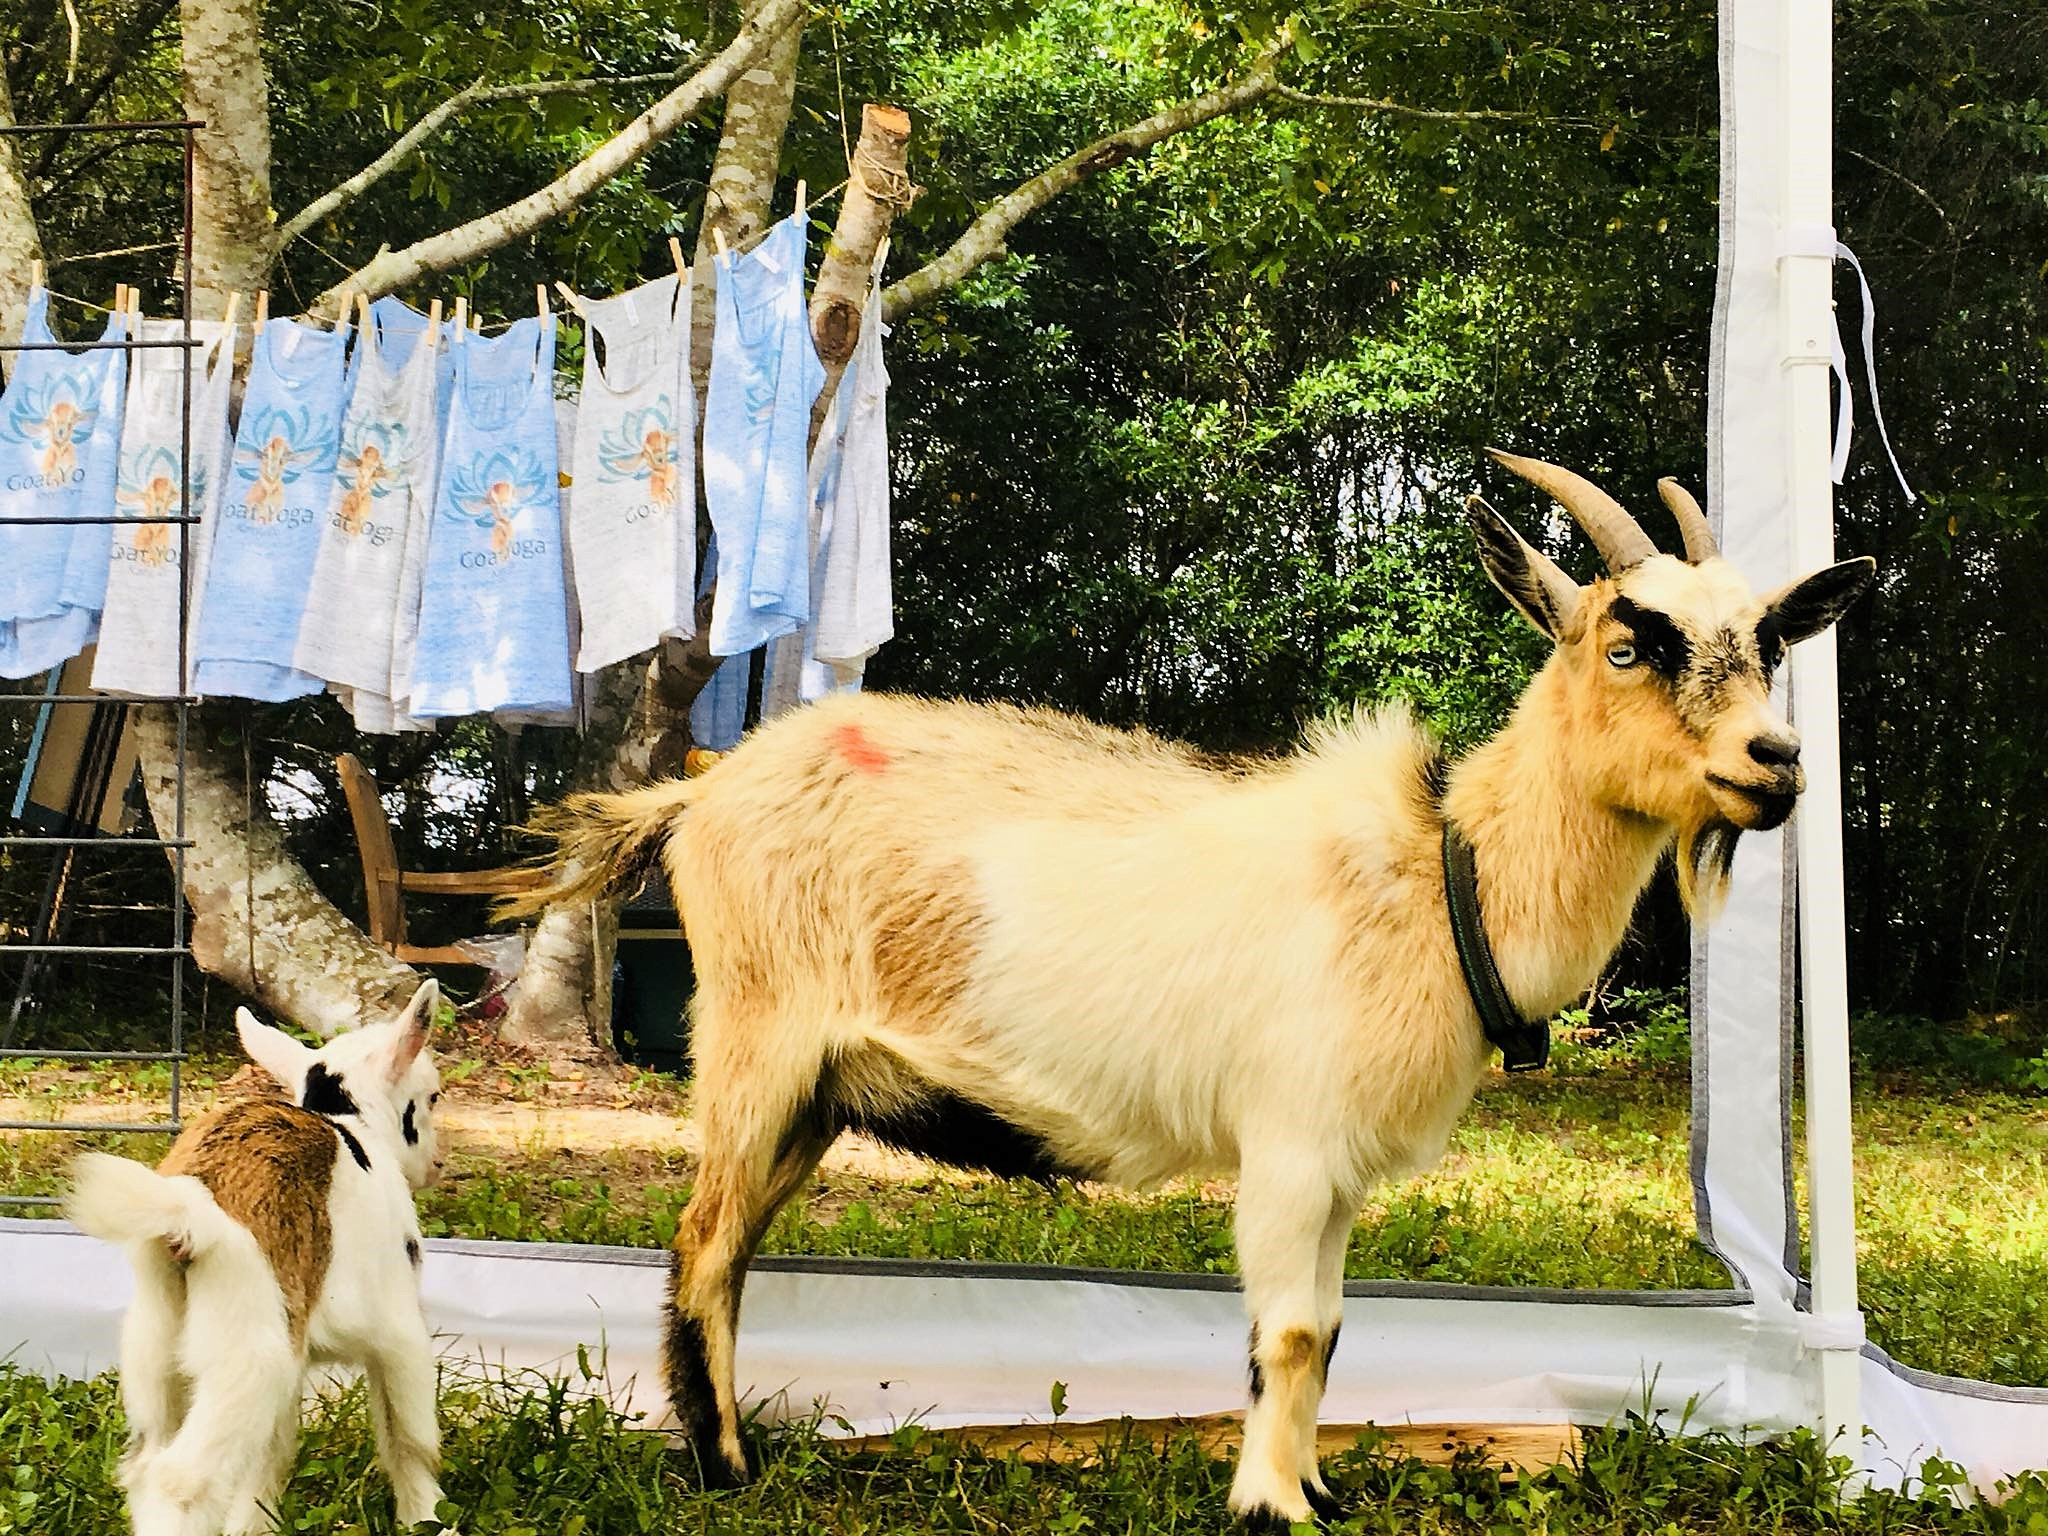 Shop Goat Gear